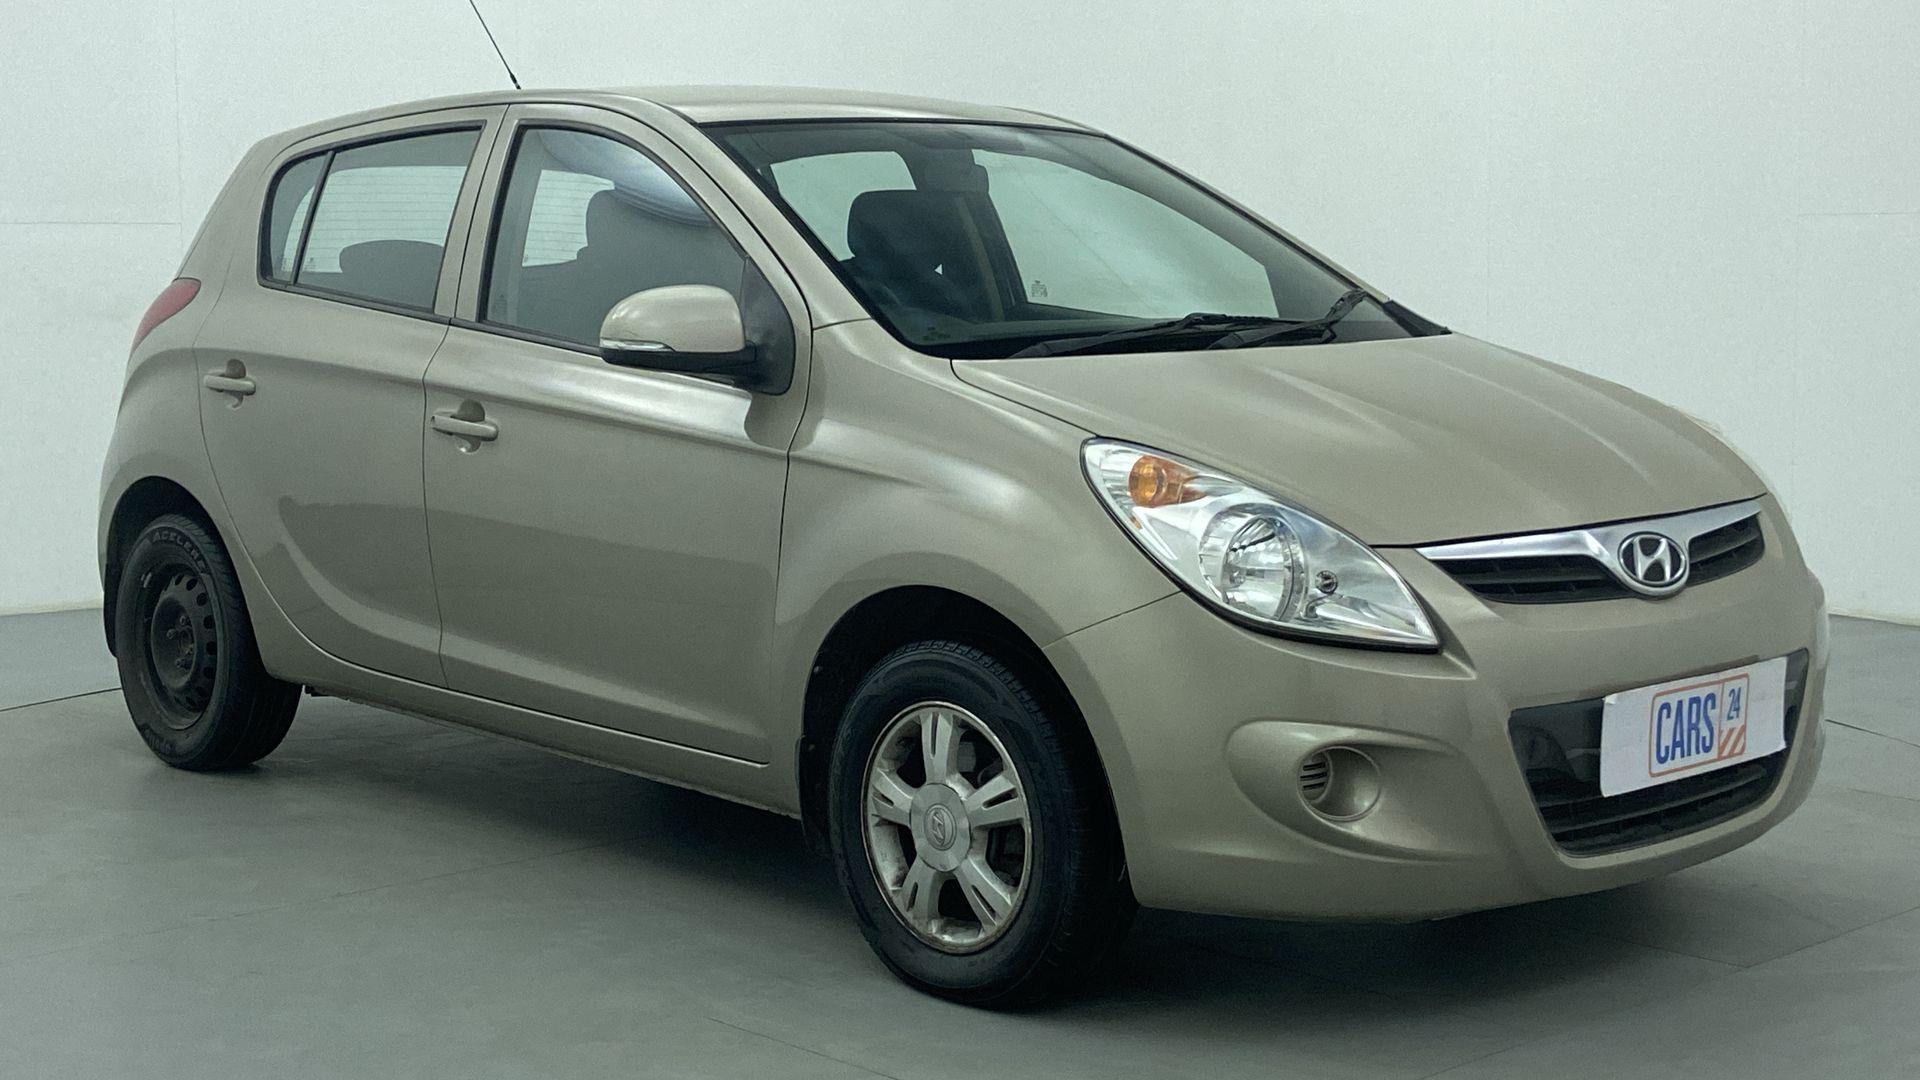 2011 Hyundai i20 SPORTZ O 1.4 CRDI